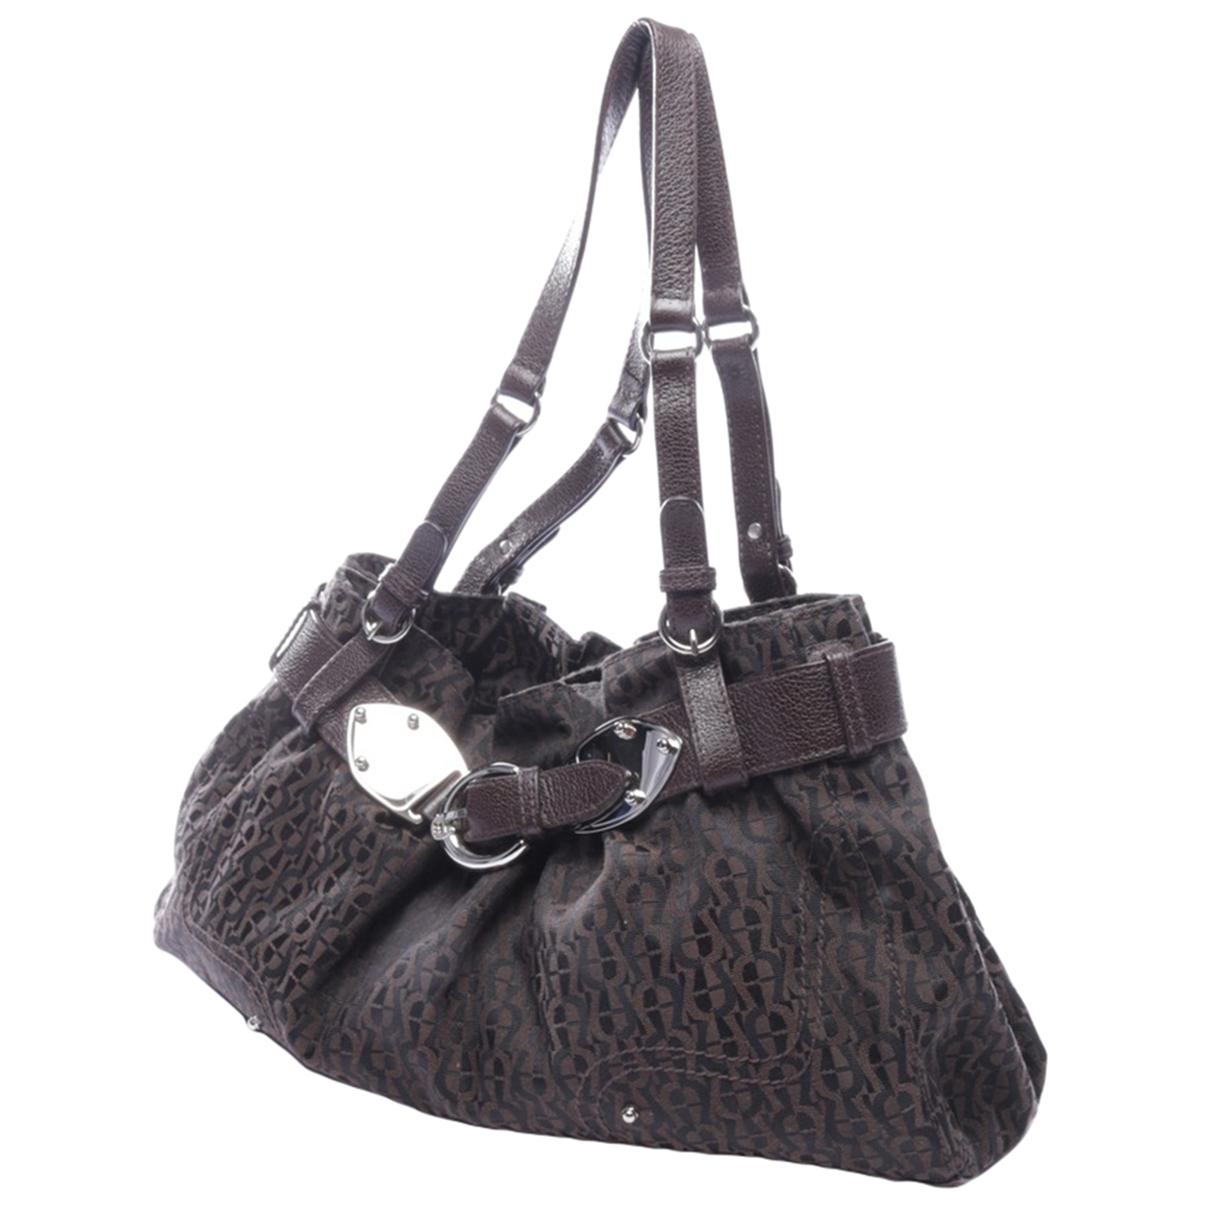 Aigner \N Brown Cloth handbag for Women \N